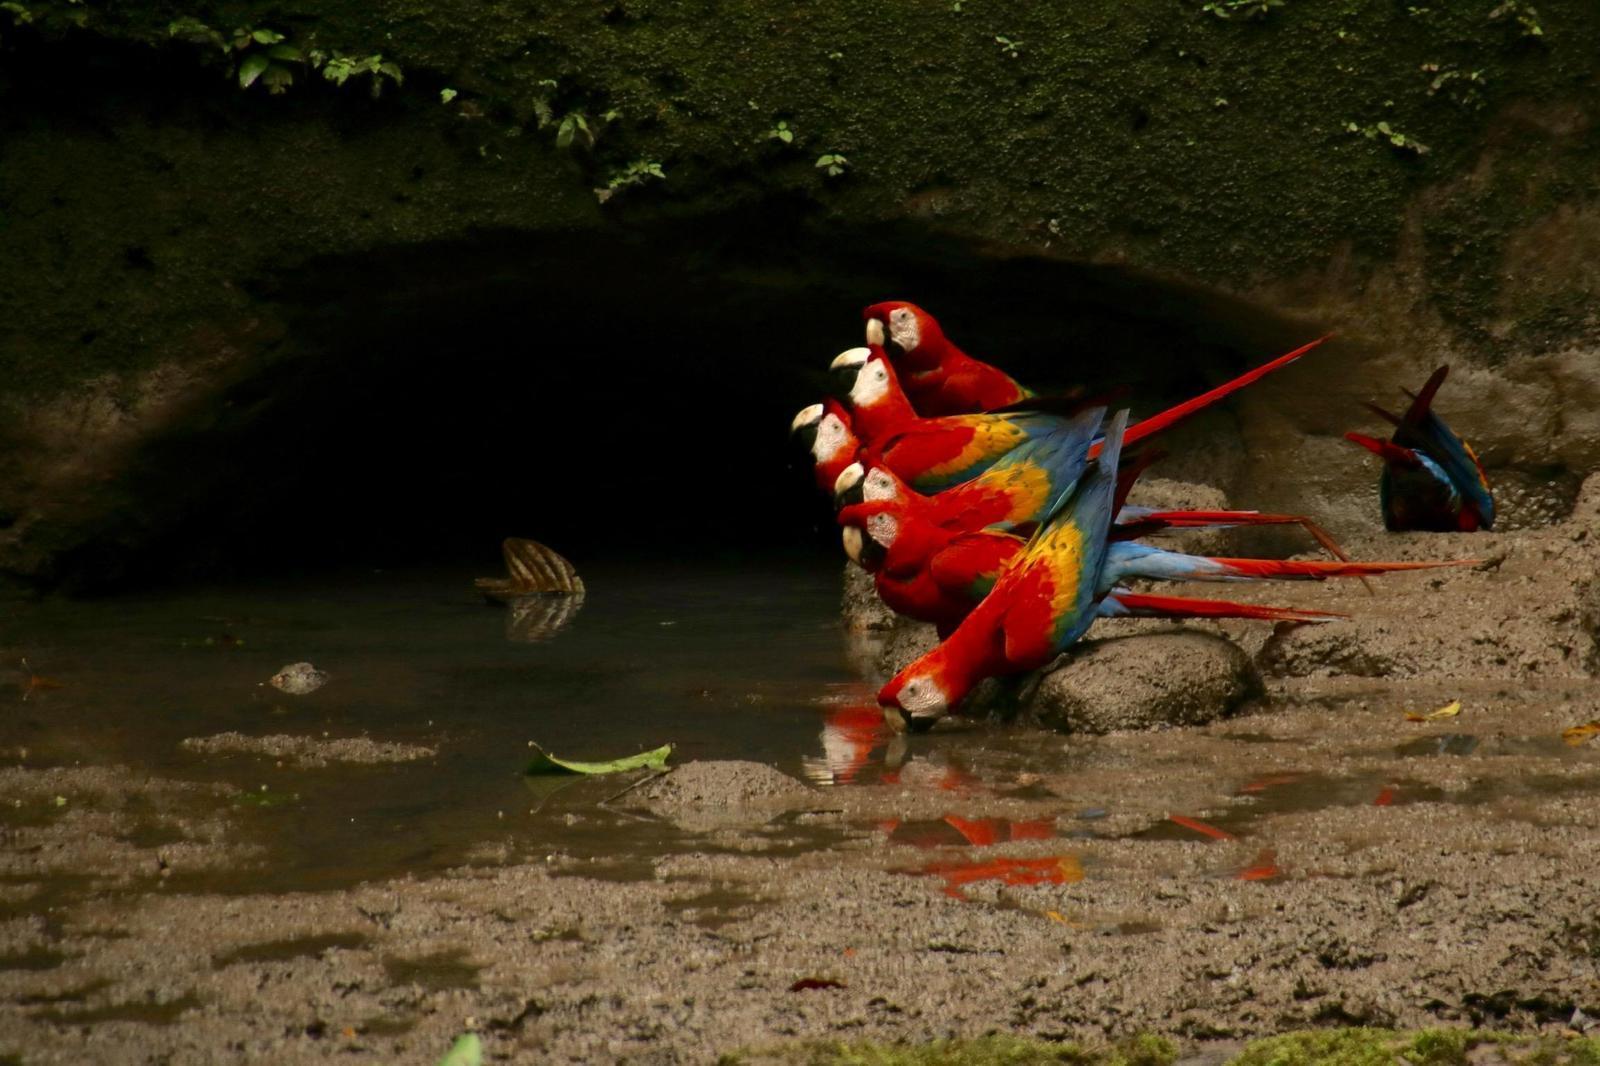 Scarlet Macaw Photo by Kathleen John